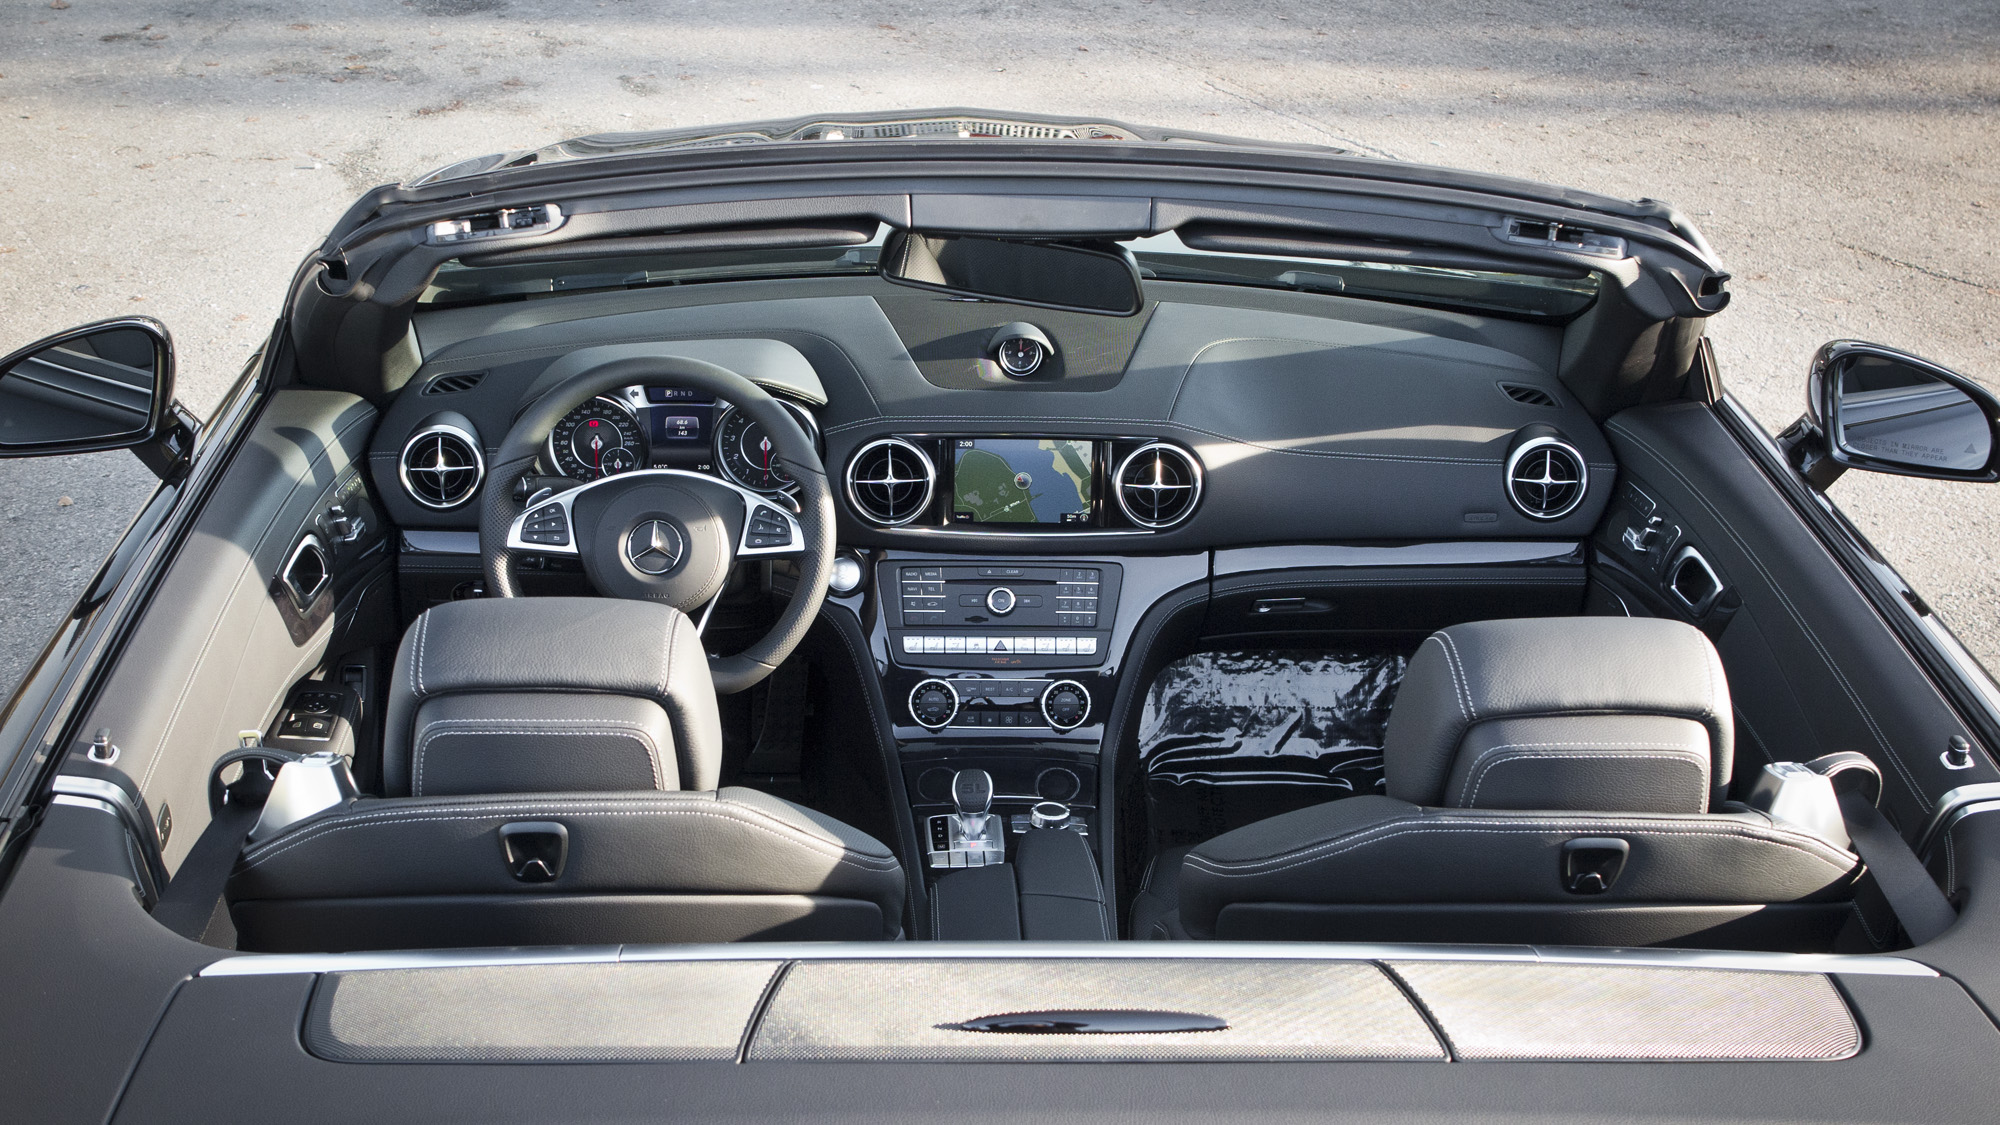 London Motor Cars >> Mercedes Benz 2019 SL550 Roadster - London Motorcars